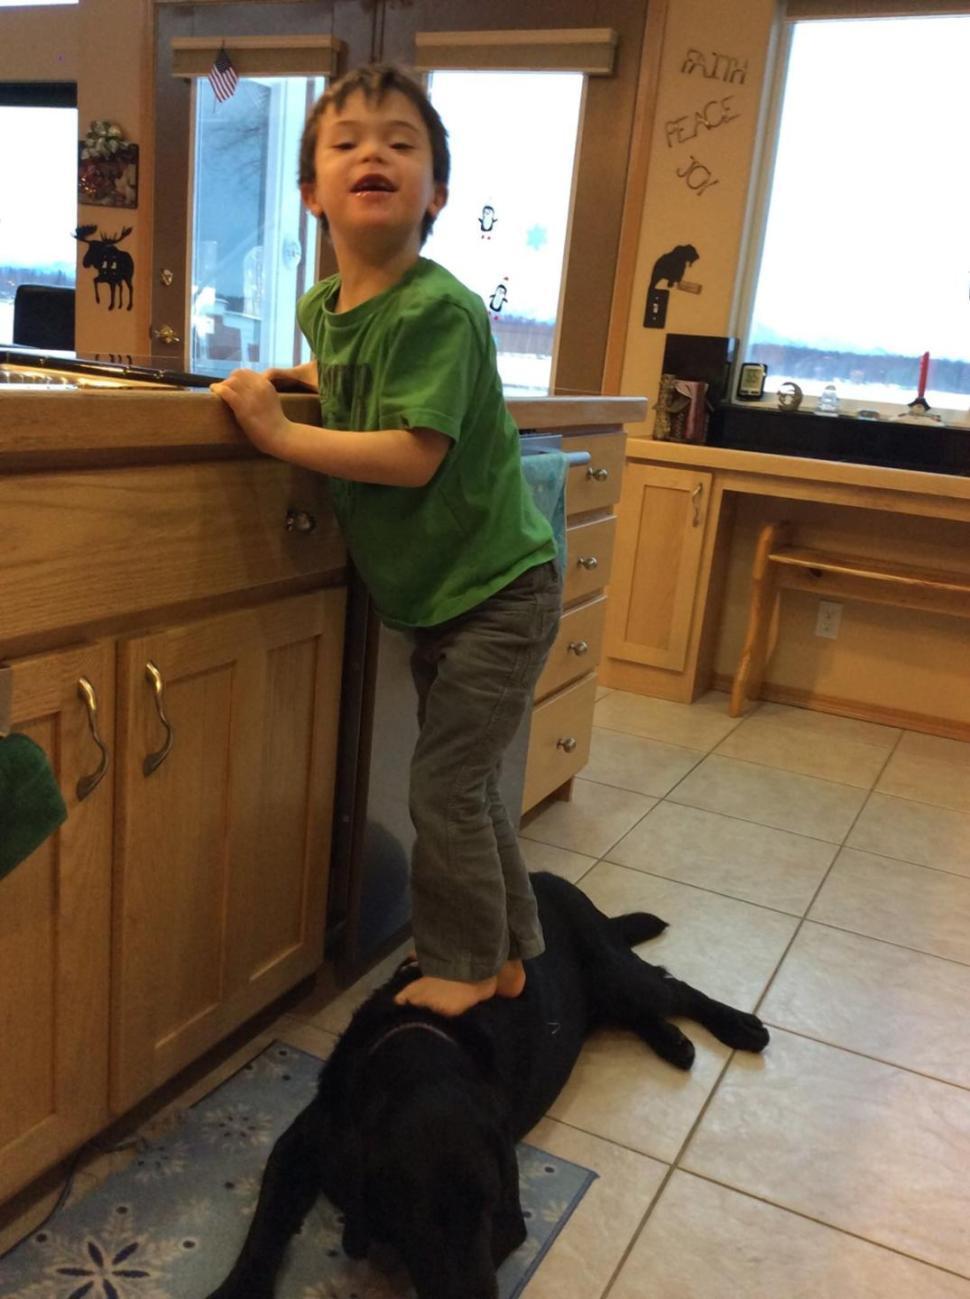 Palins kid stands on dog